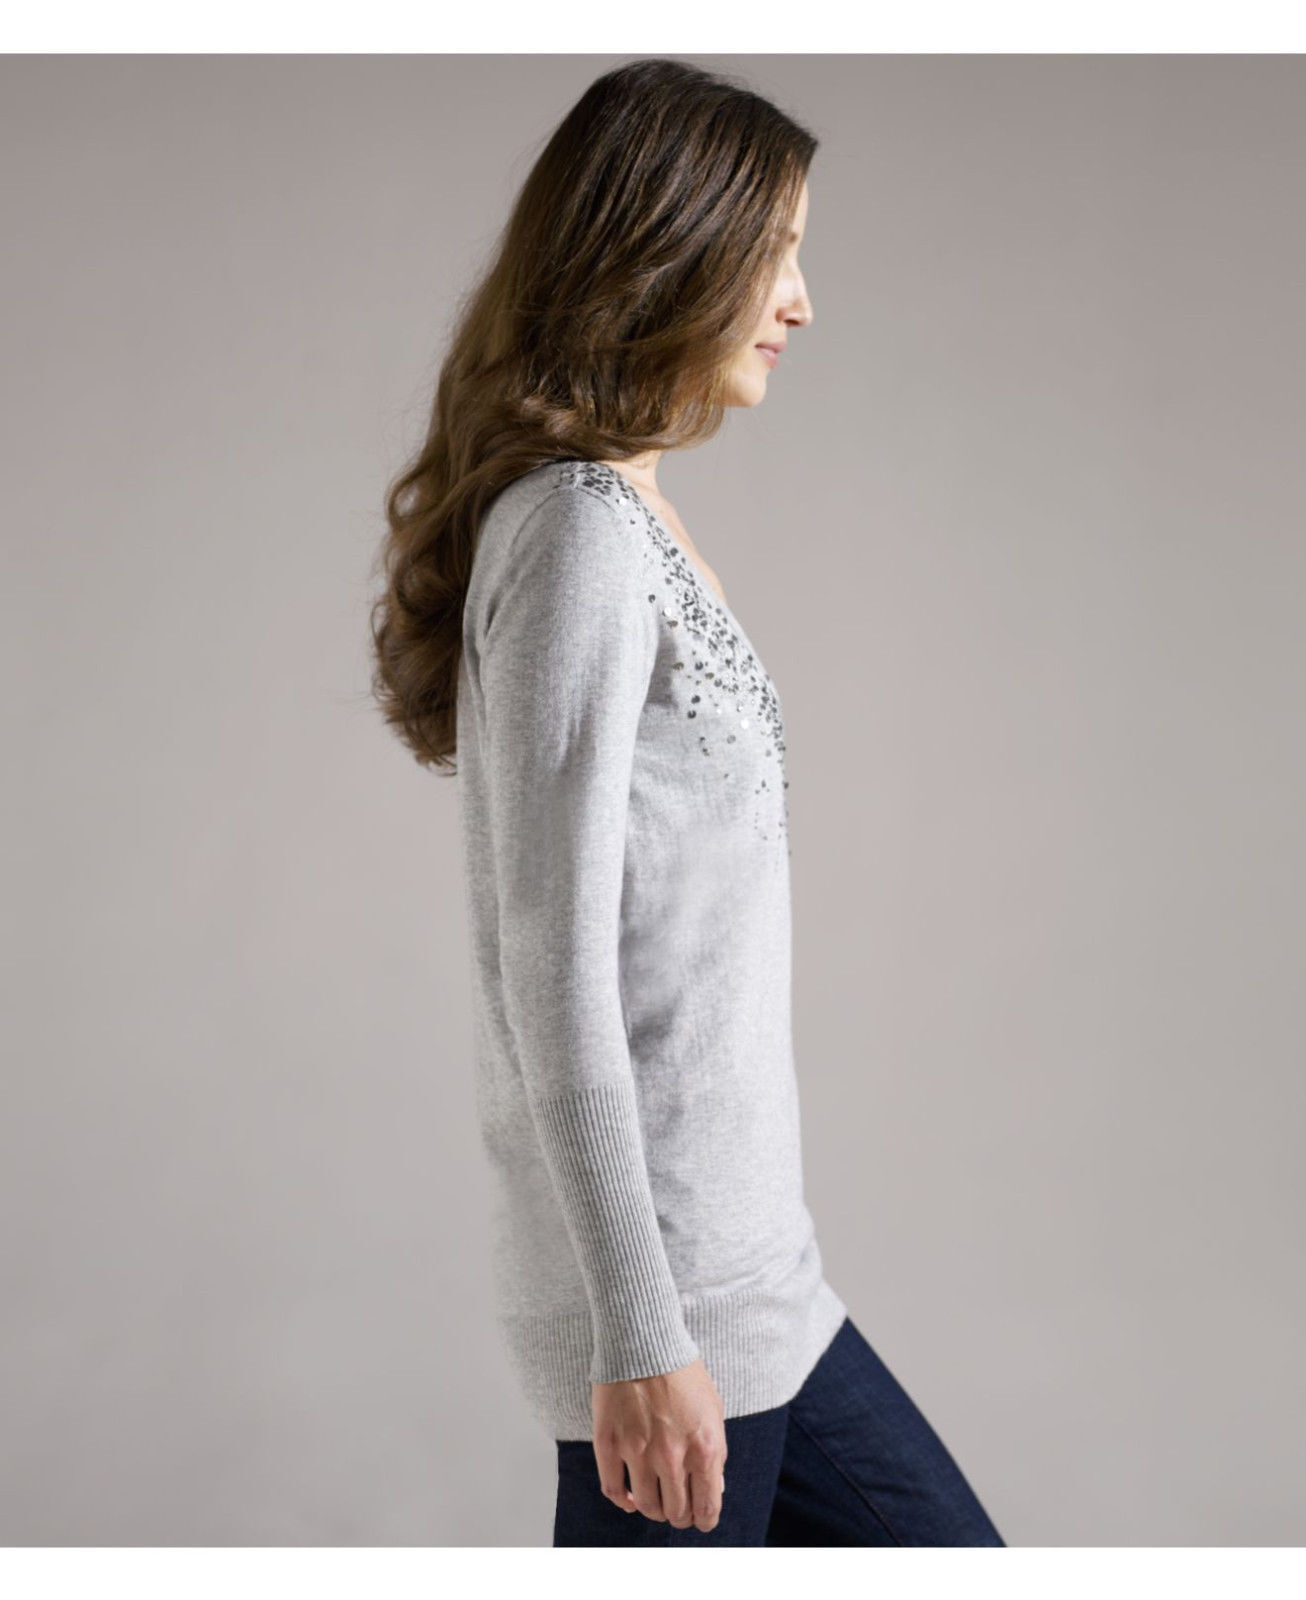 218 BNWT EILEEN FISHER Organic Organic Organic Cotton Cashmere w  Sequins DARK PEARL Long Top L 890dc1